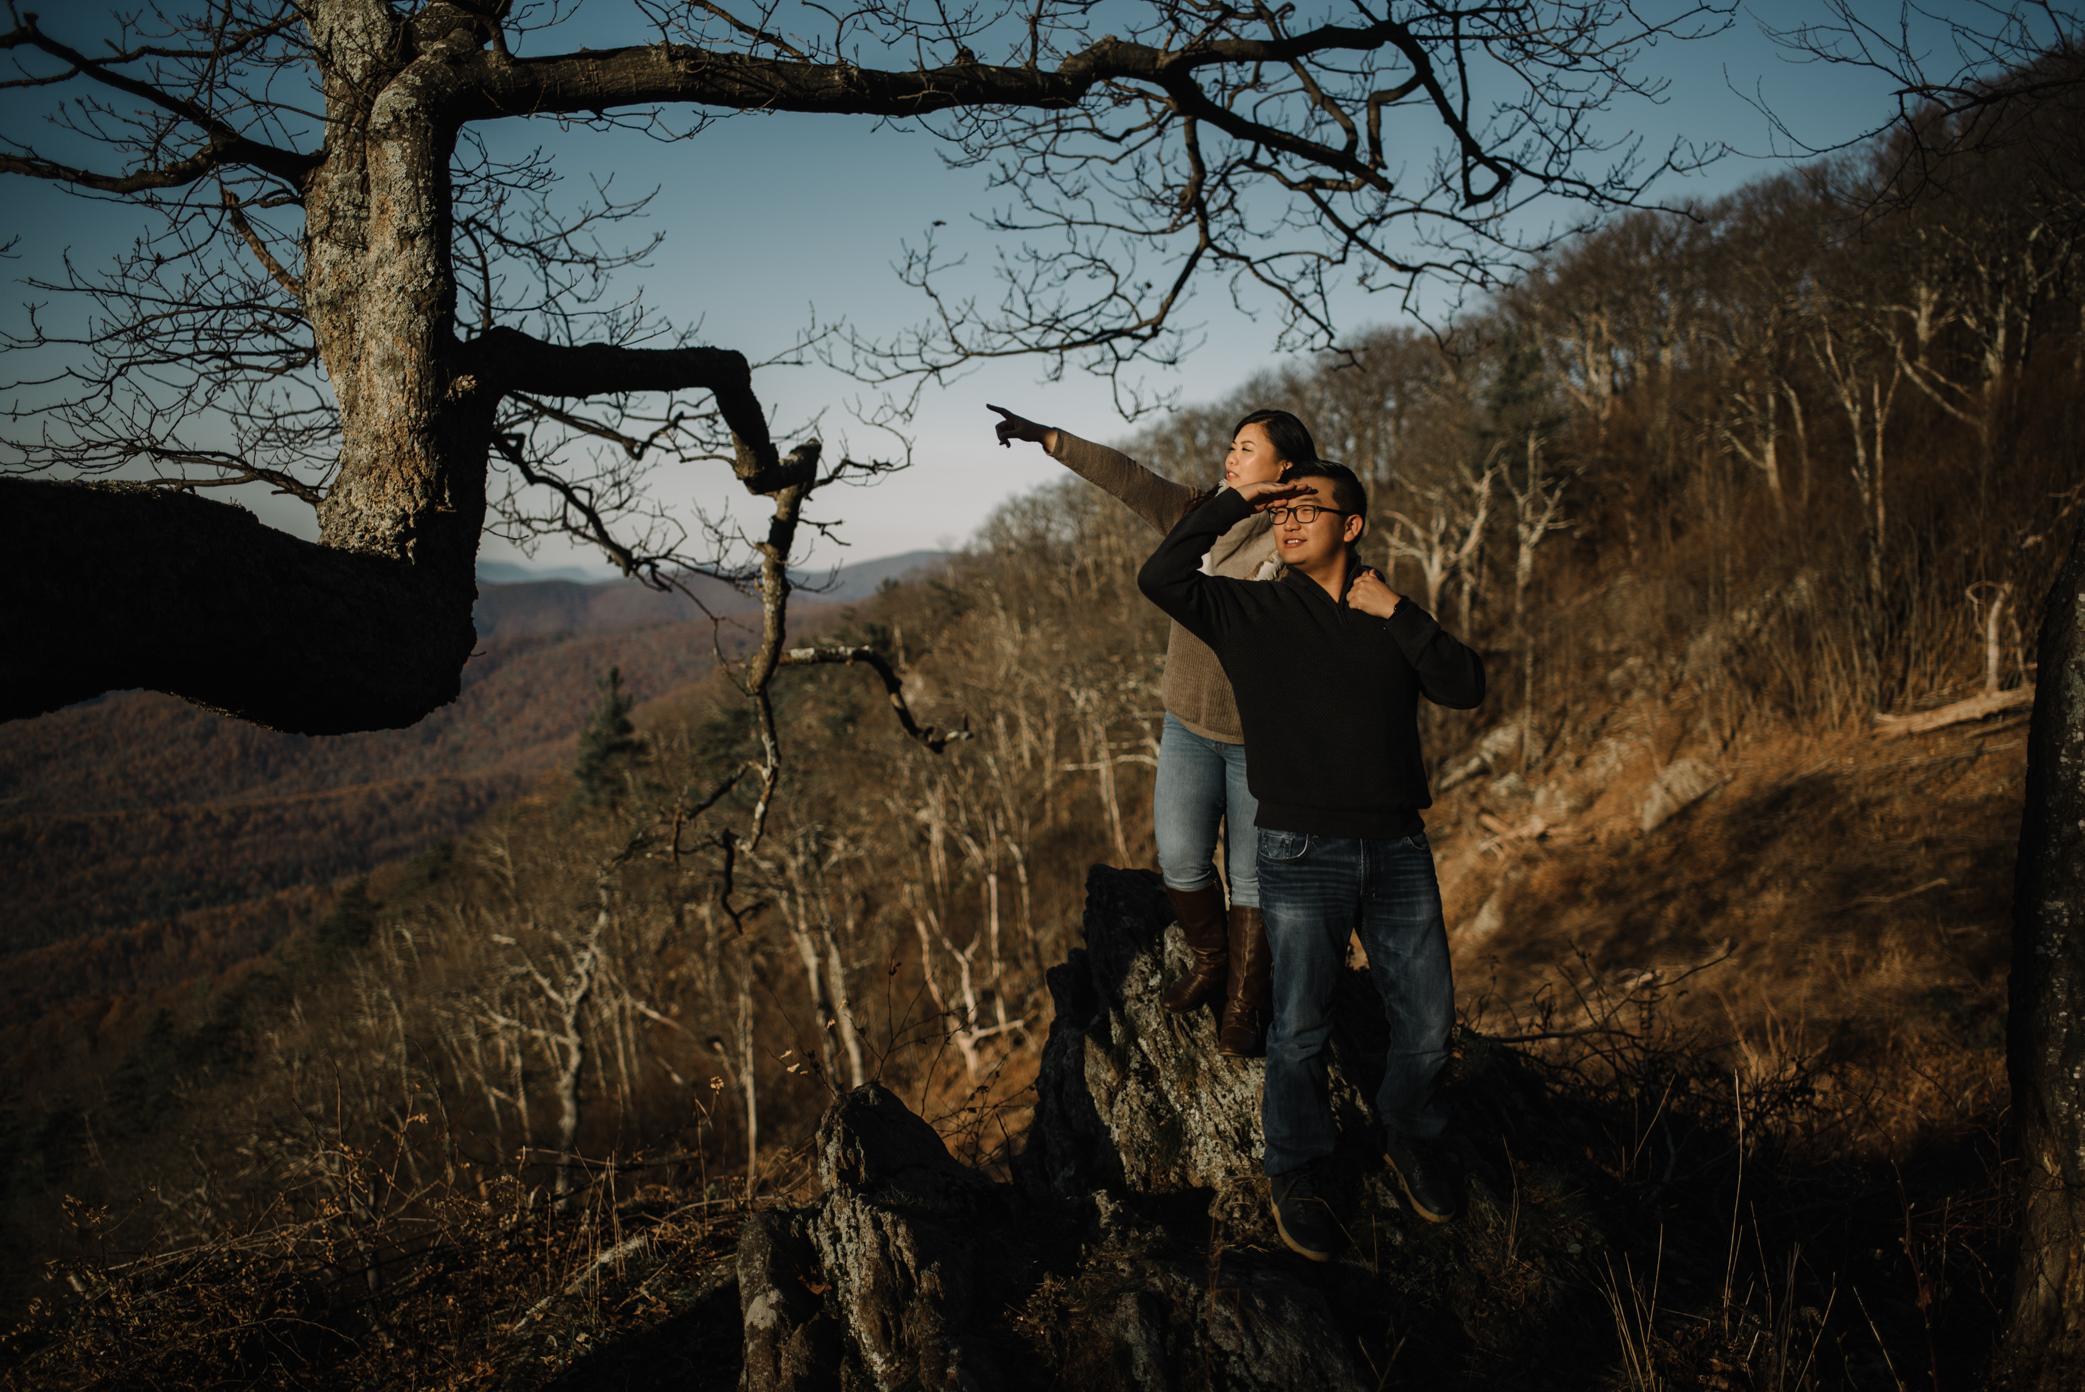 Joshua and Kristina - Shenandoah National Park - Skyline Drive - Winter Engagement Session Photographer - White Sails Creative_5.JPG